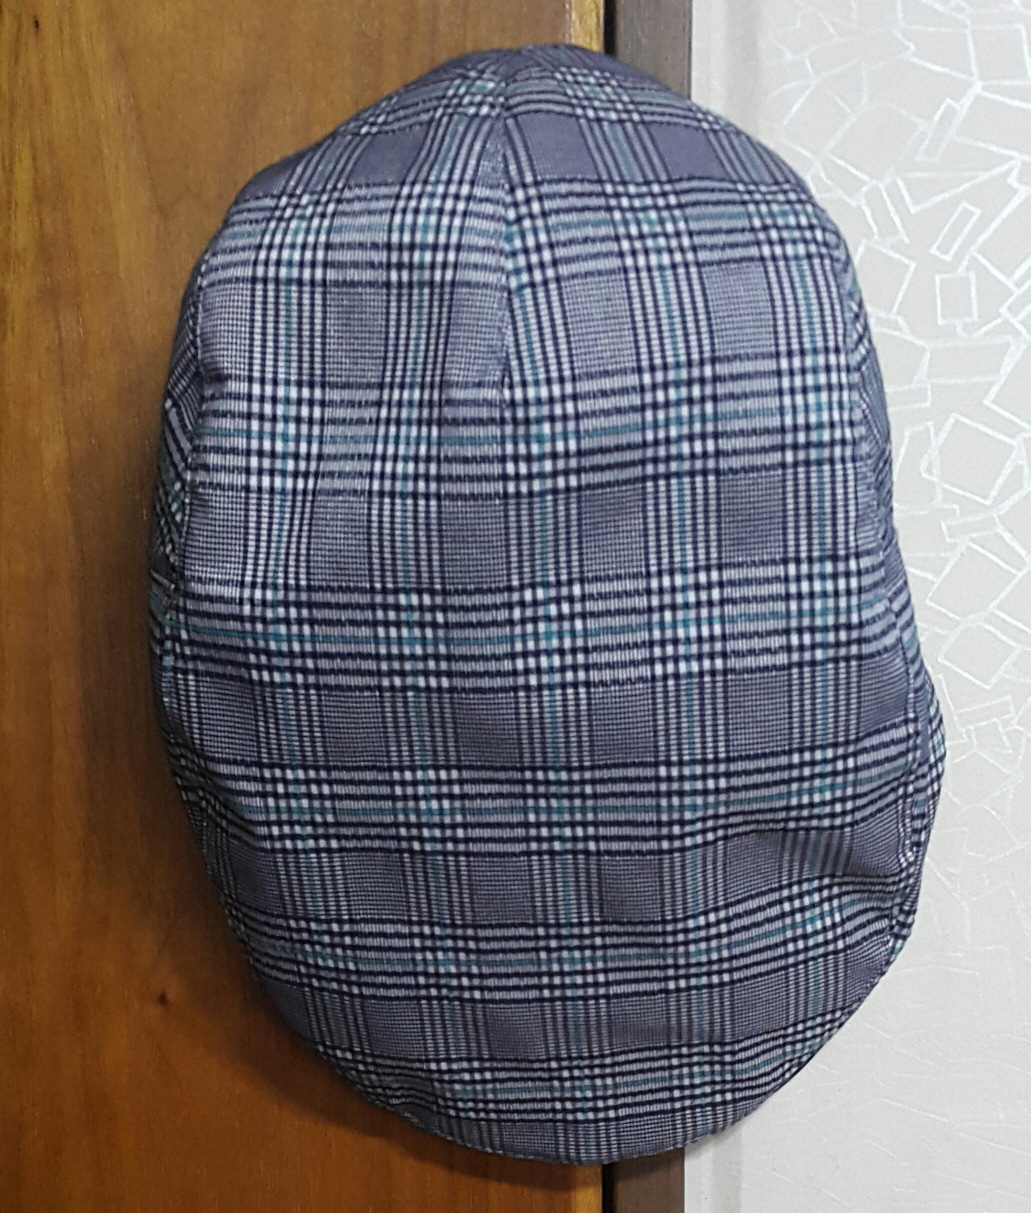 SGF67 남성 골프웨어 (봄.여름.가을.)남성 체크무늬 모자 팝니다.